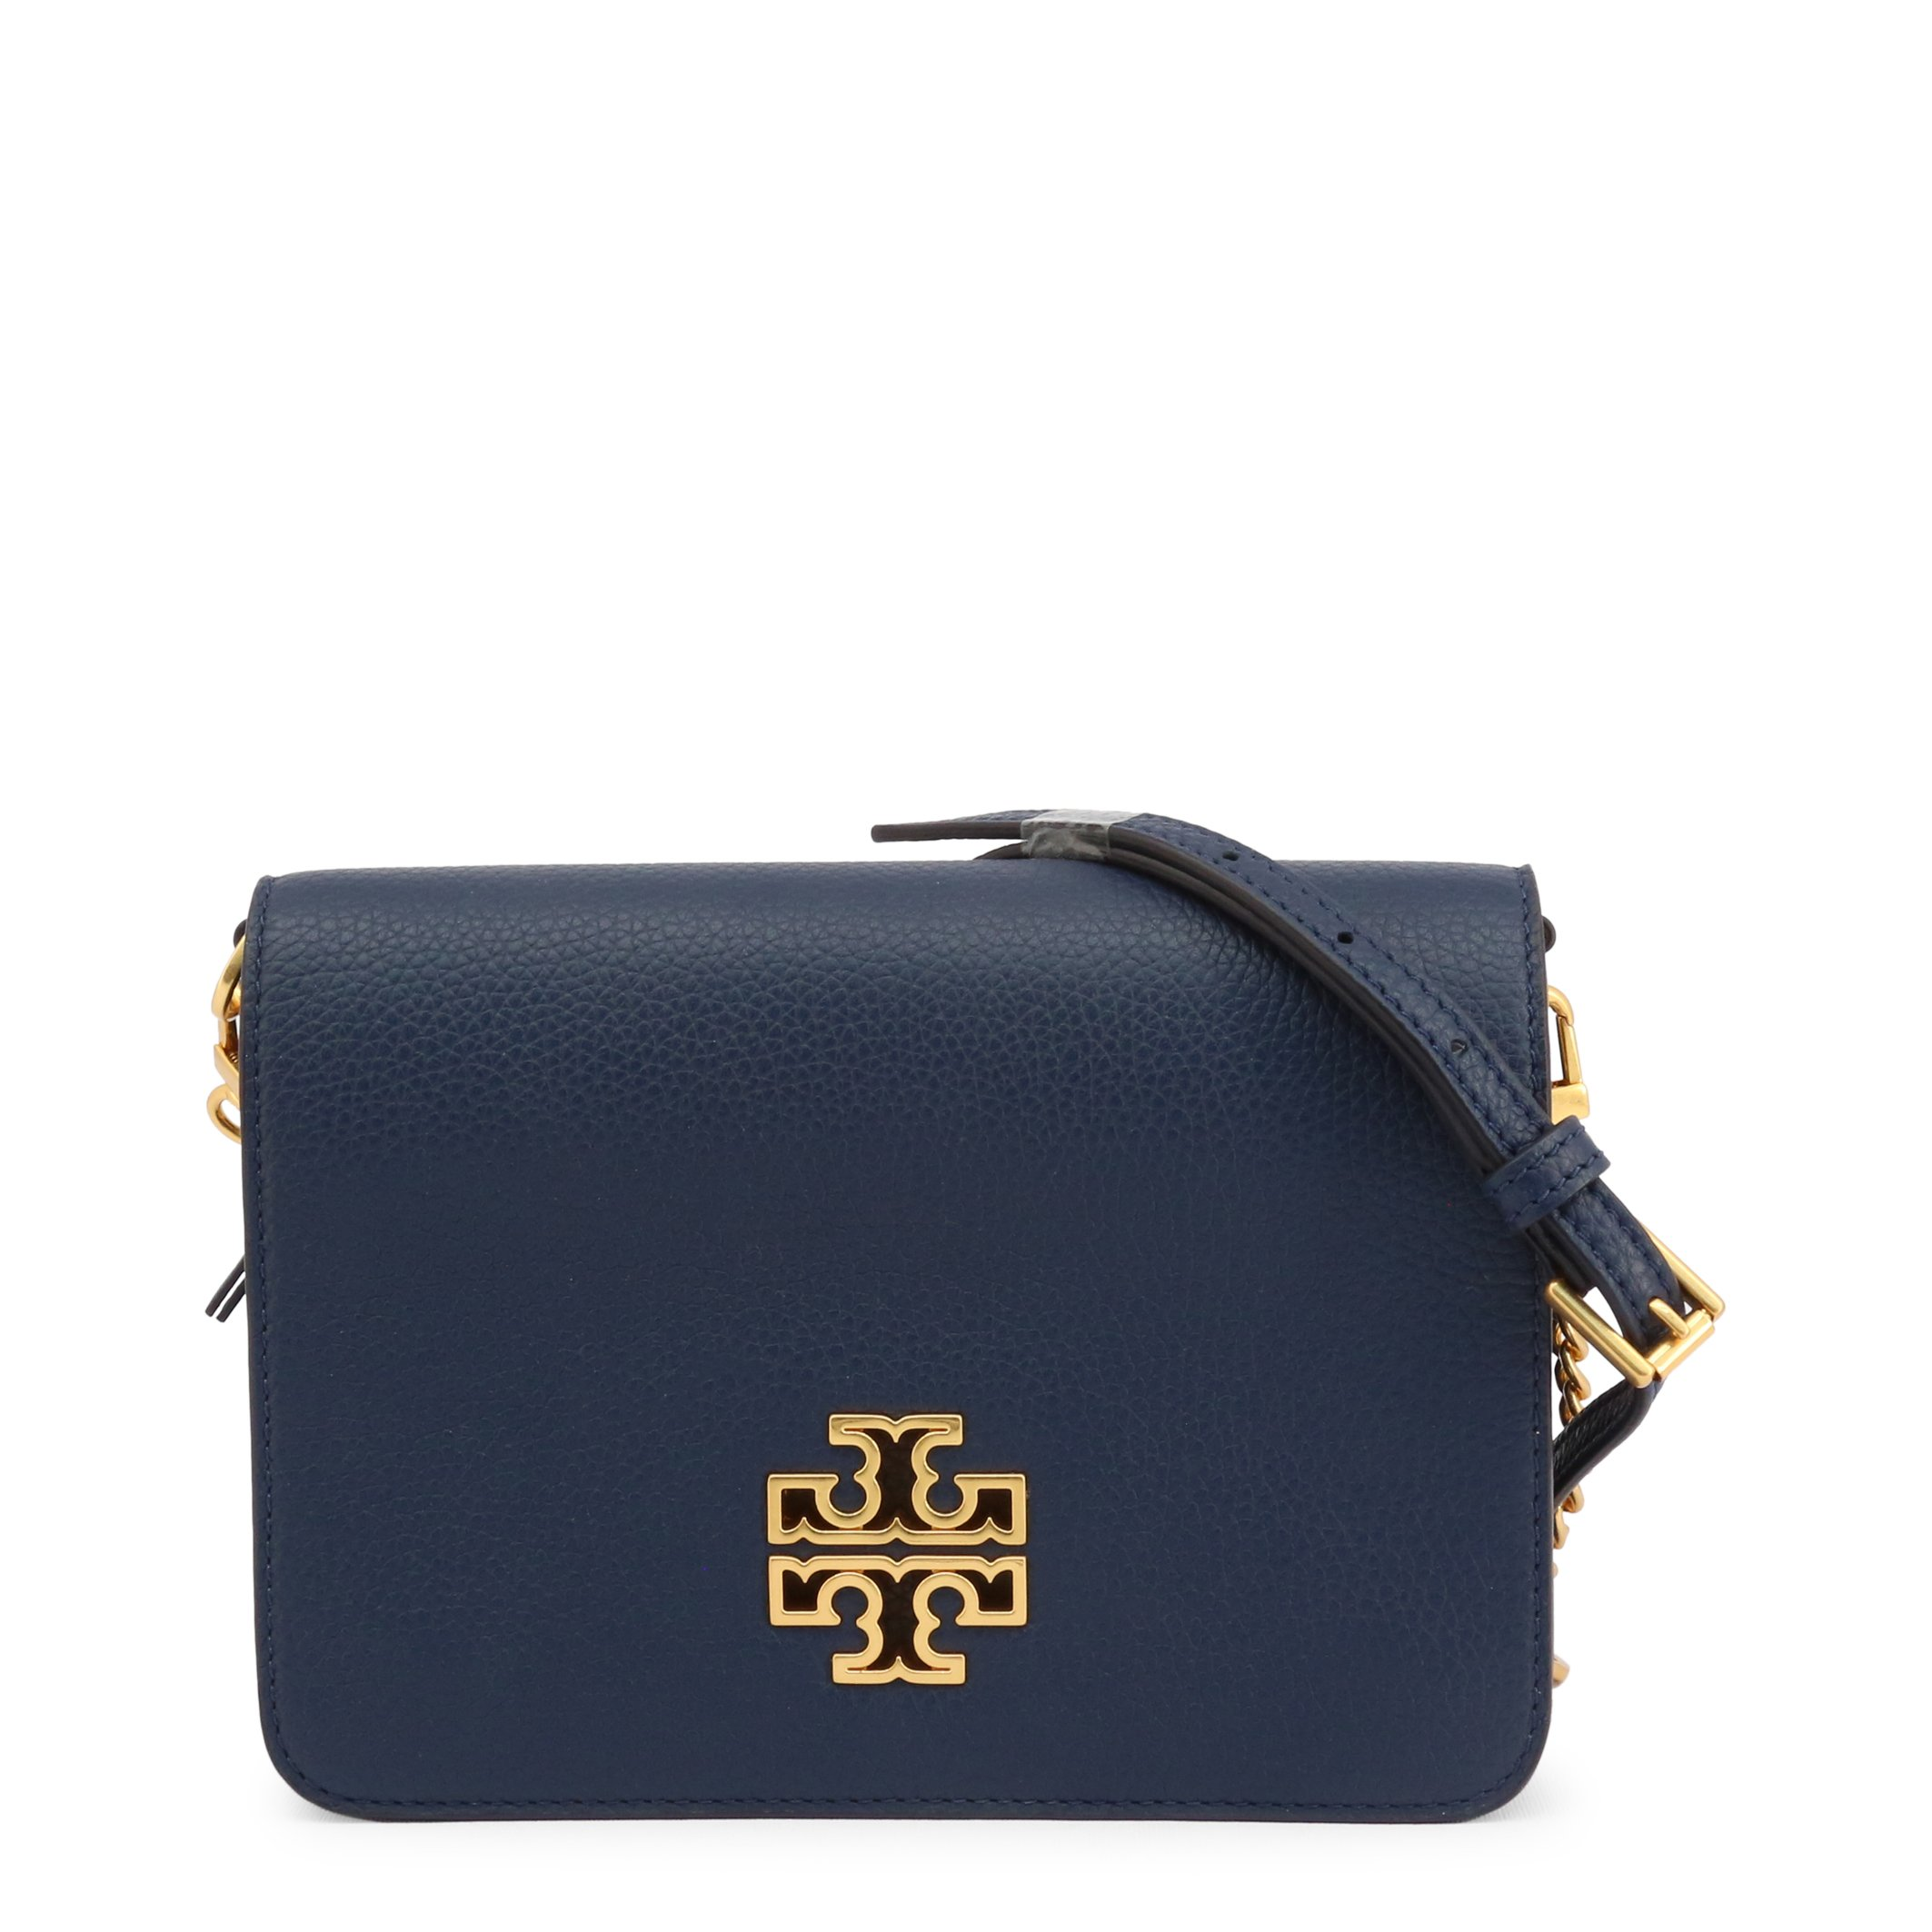 Tory Burch Women's Crossbody Bag Various Colours 67293 - blue NOSIZE